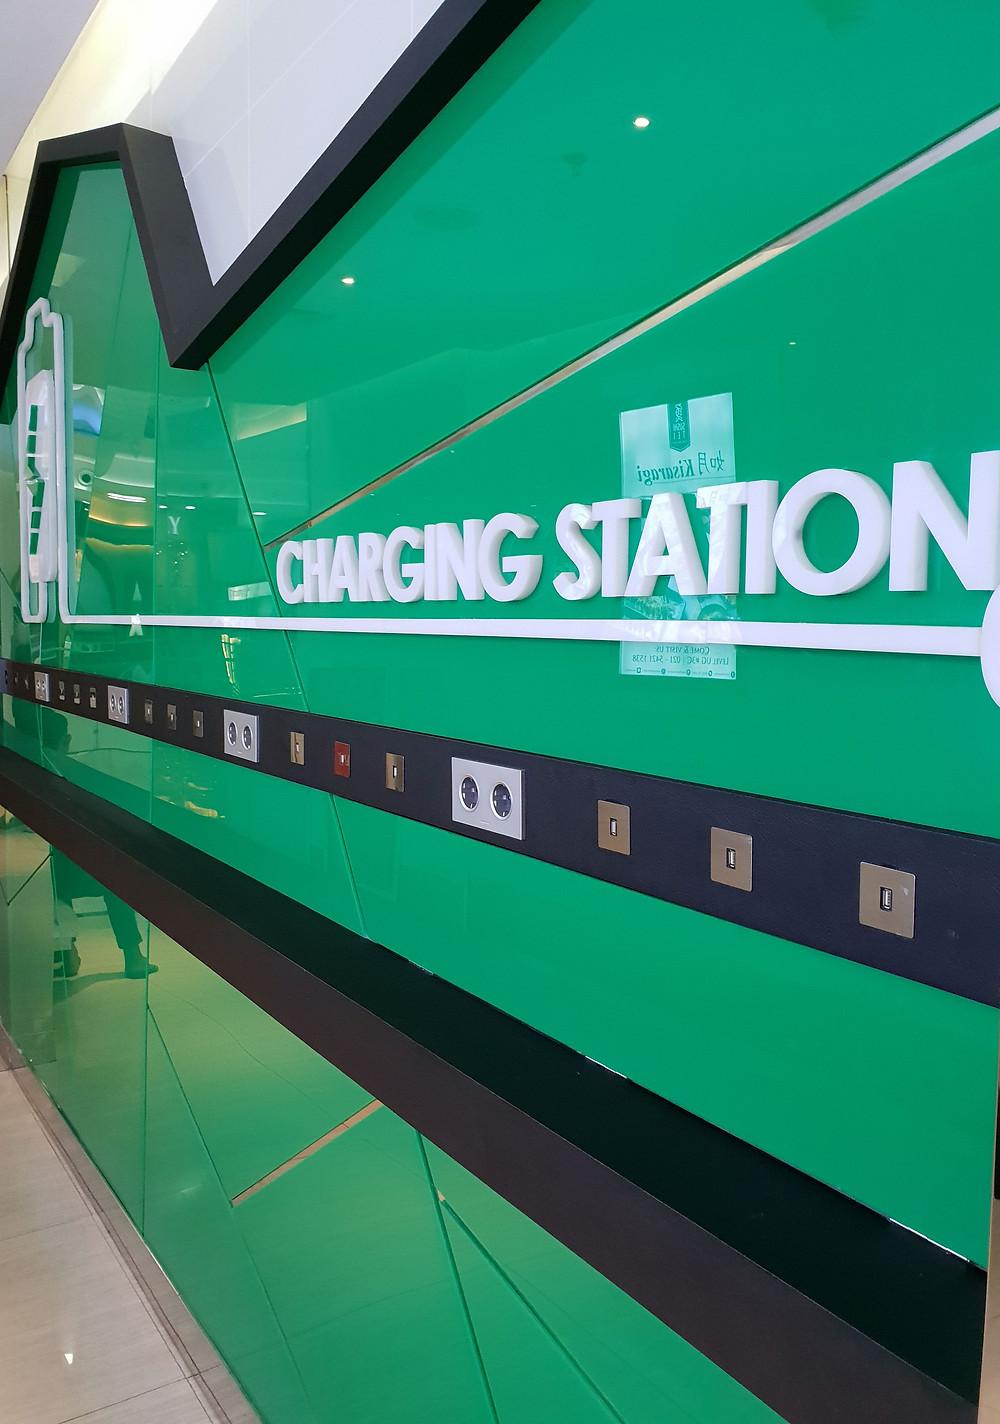 Charging Station Acrylic Sheet